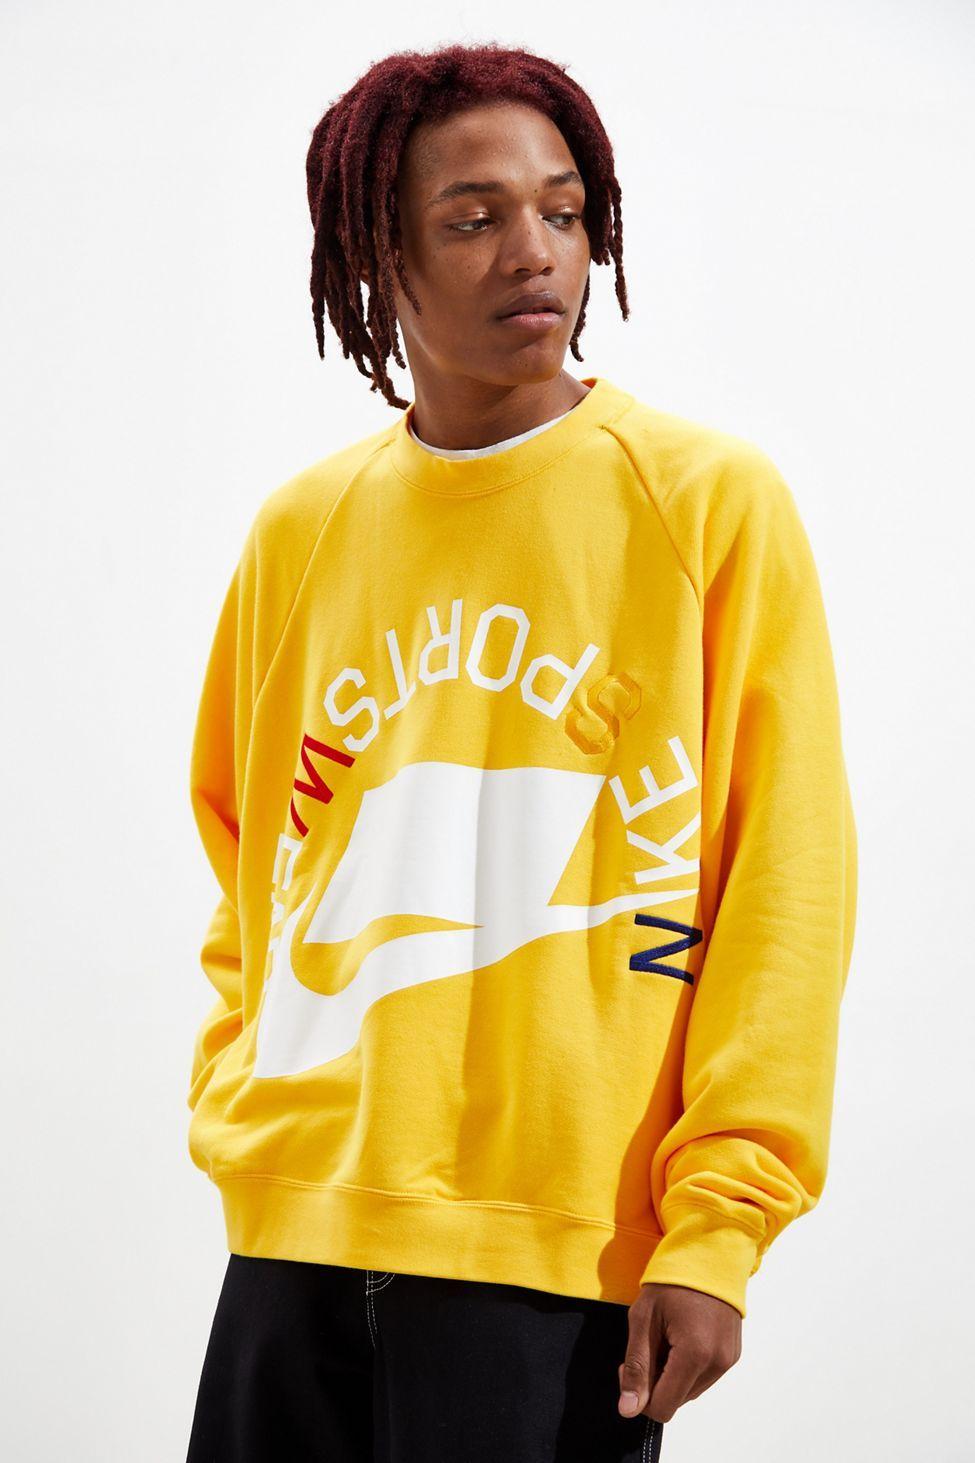 Pin By Maria Calvo On Men S Essentials Crew Neck Sweatshirt Sweatshirts Sportswear [ 1463 x 975 Pixel ]